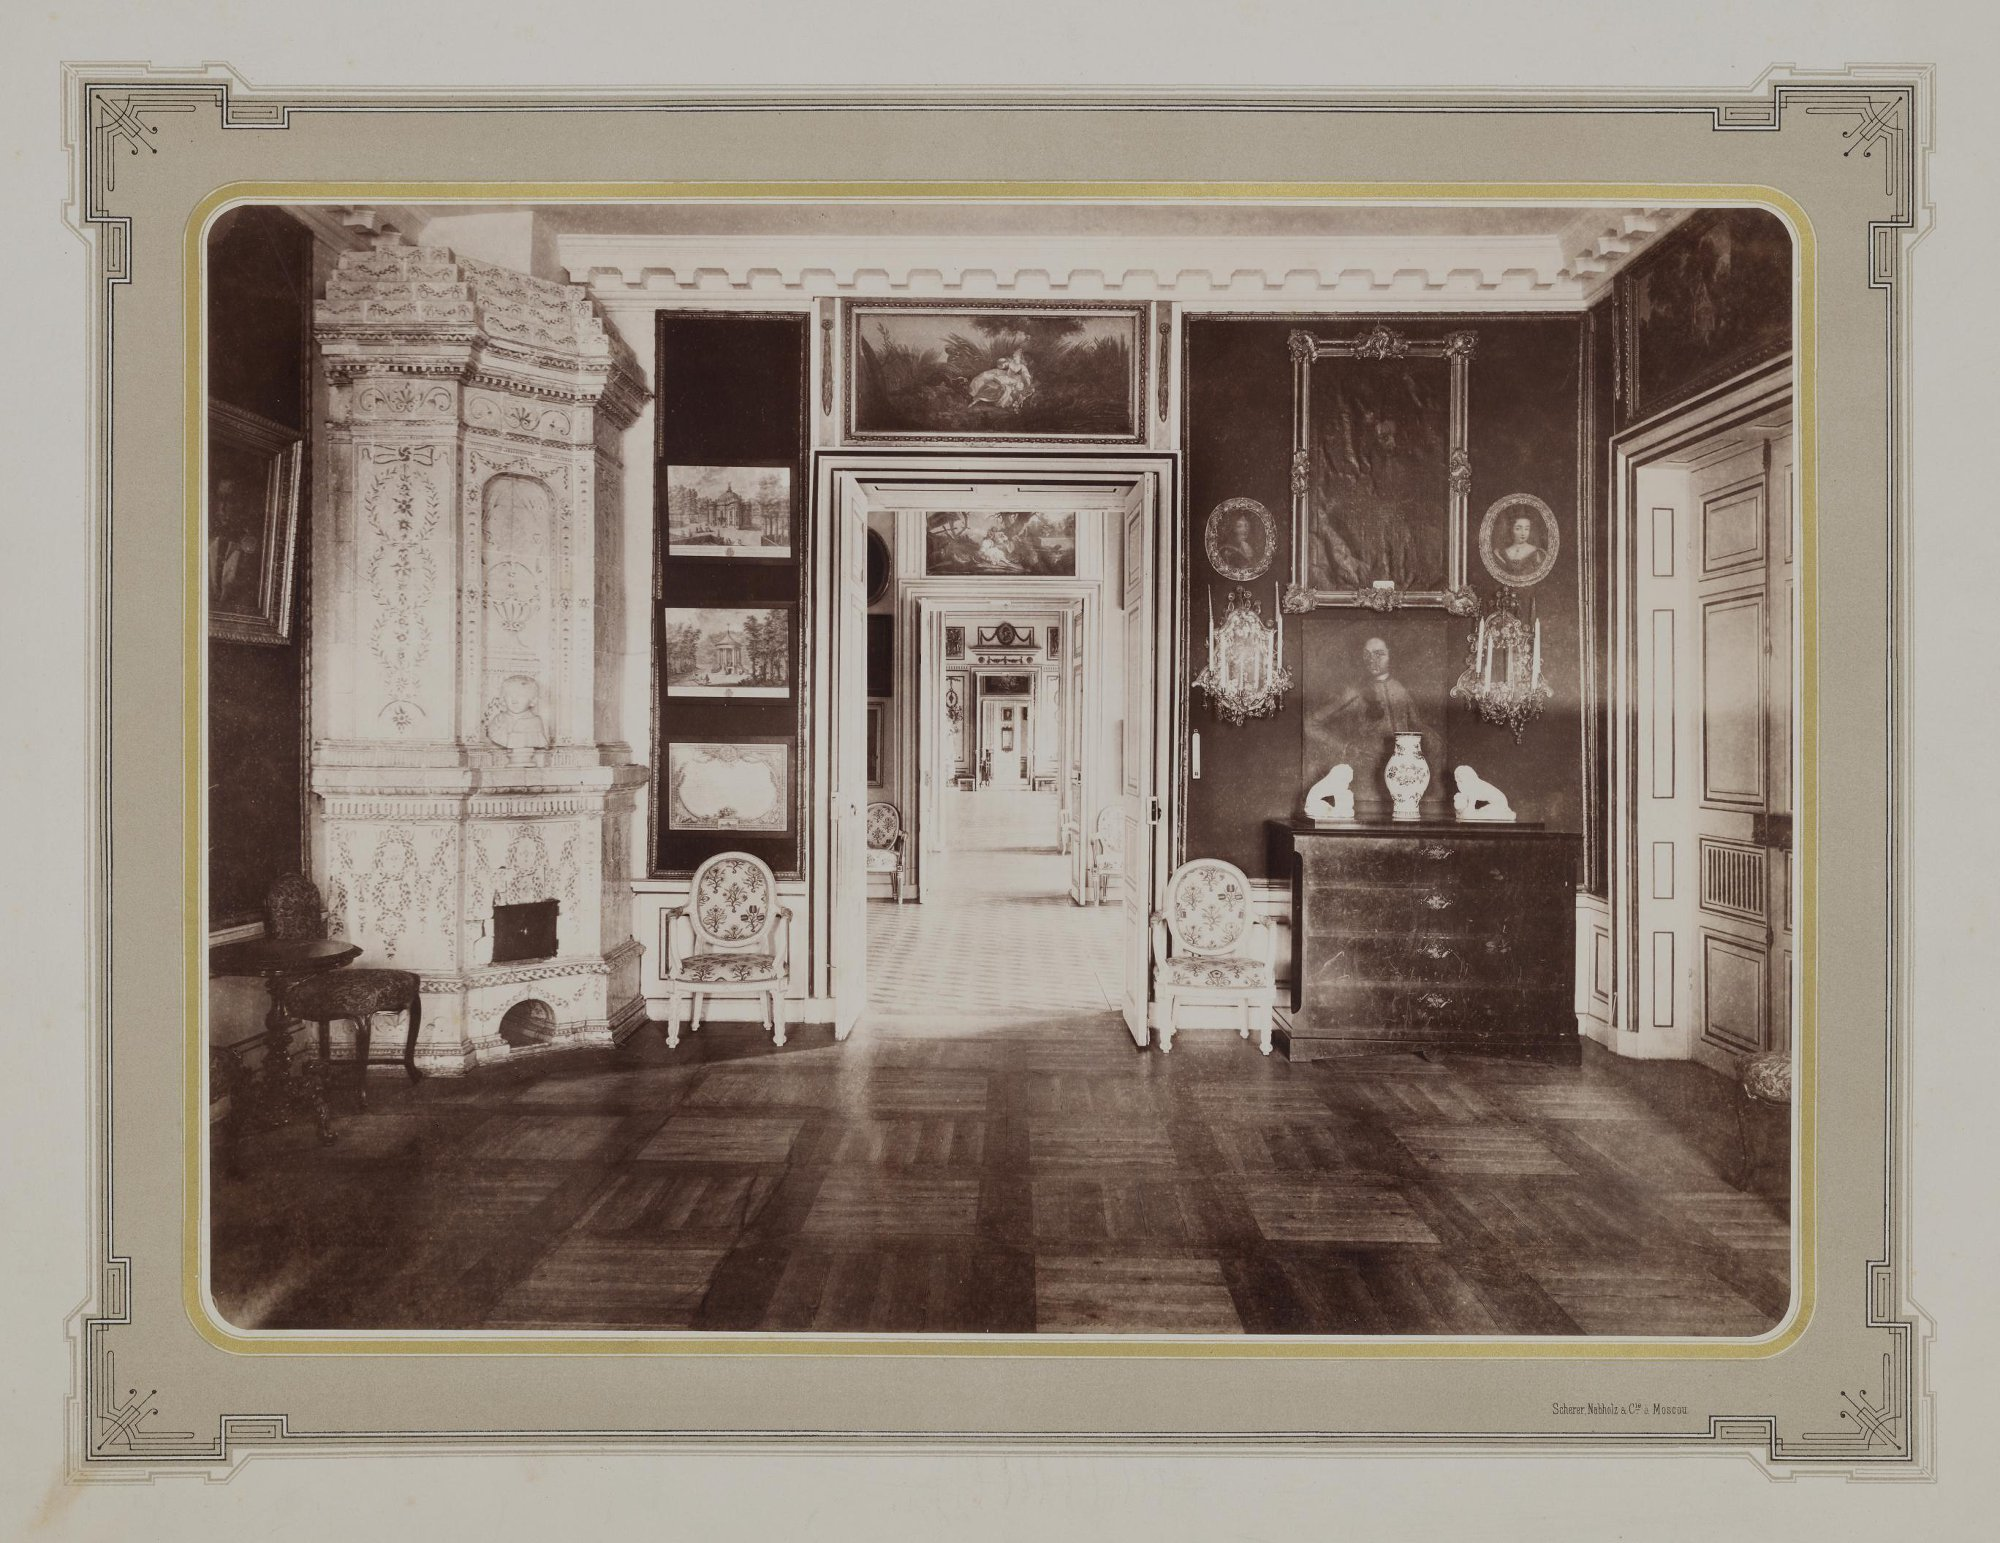 1883-1886. Усадьба Кусково. Дворец. Музыкальная гостиная